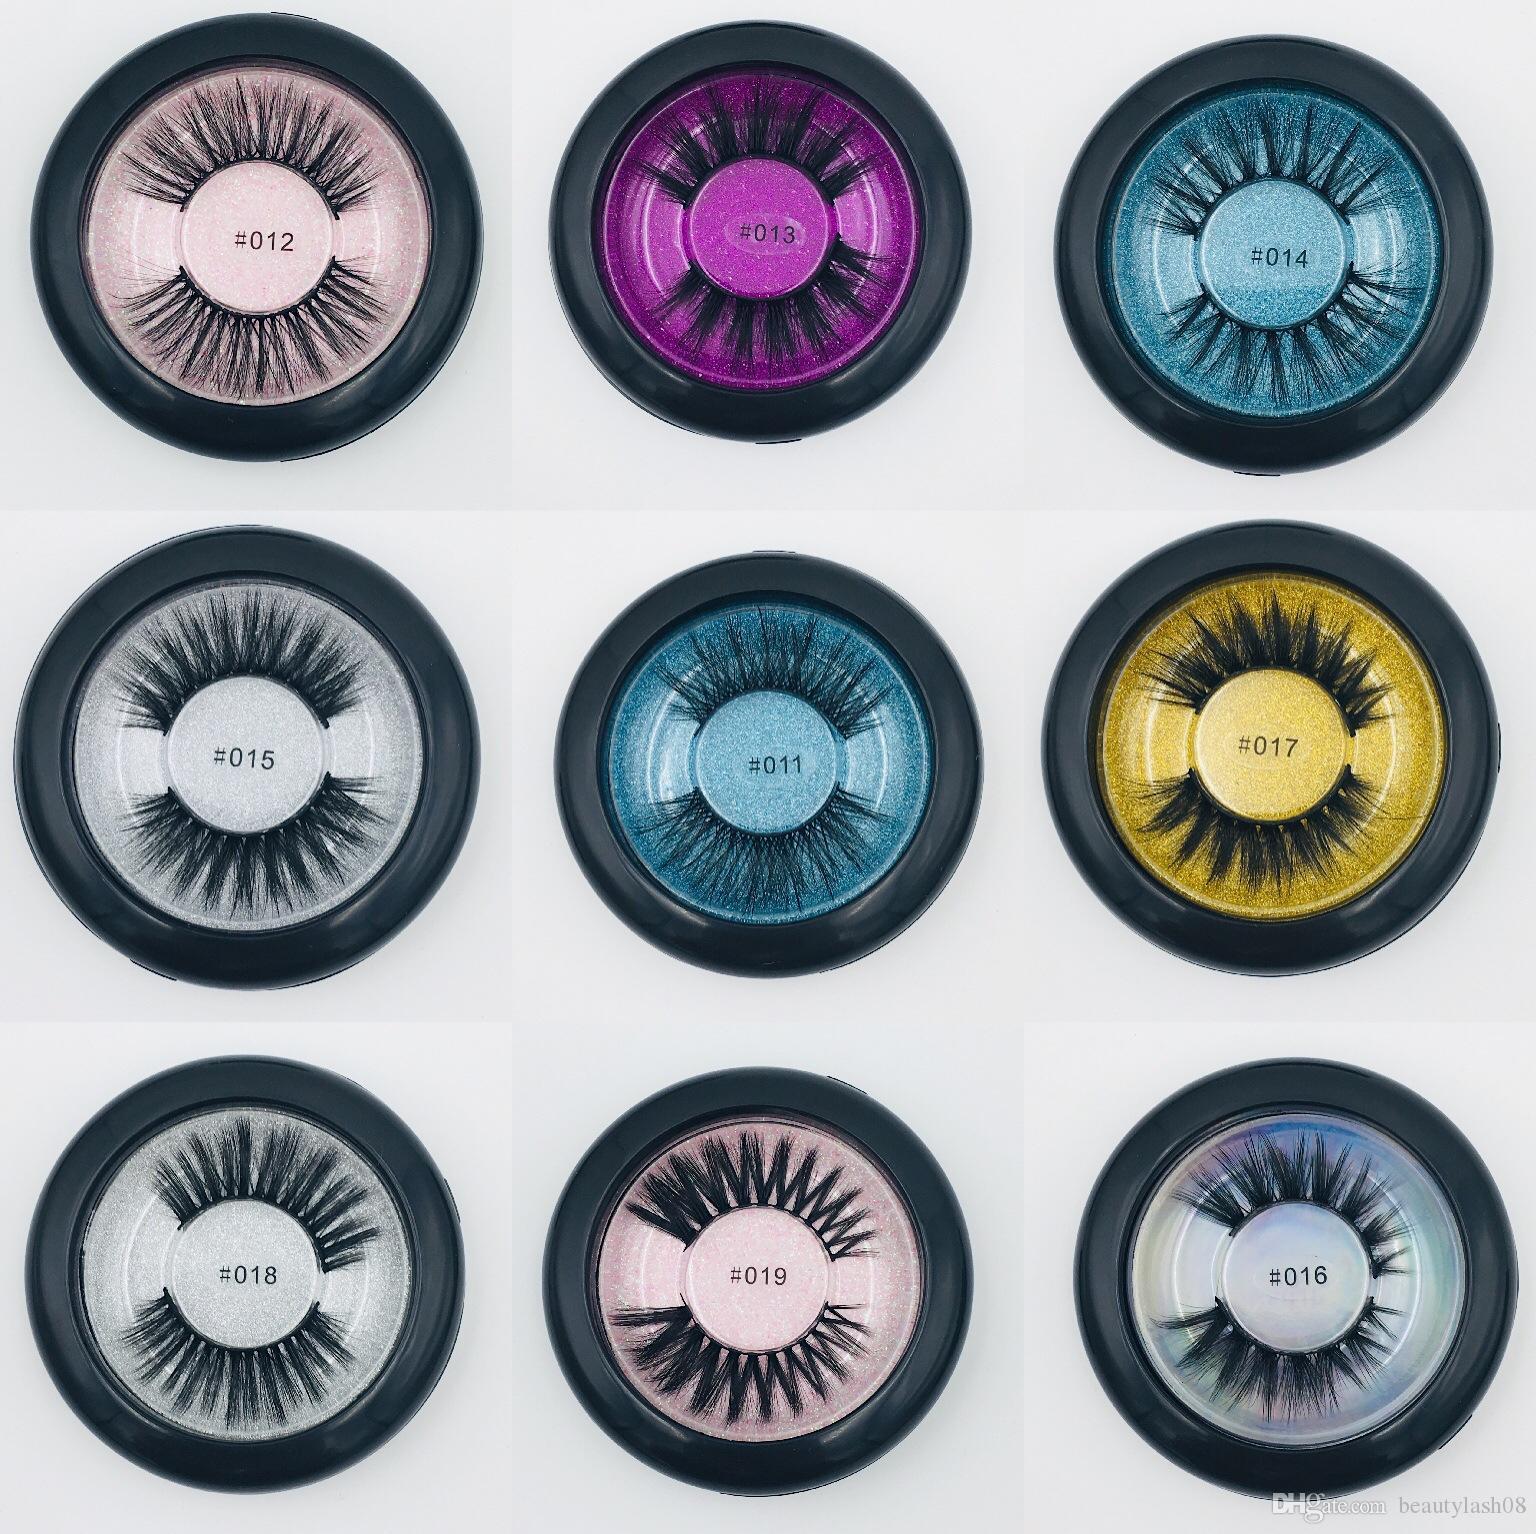 False eyelashes makeup natural long 3d mink real-like lashes fake eye lashes makeup beauty lashes